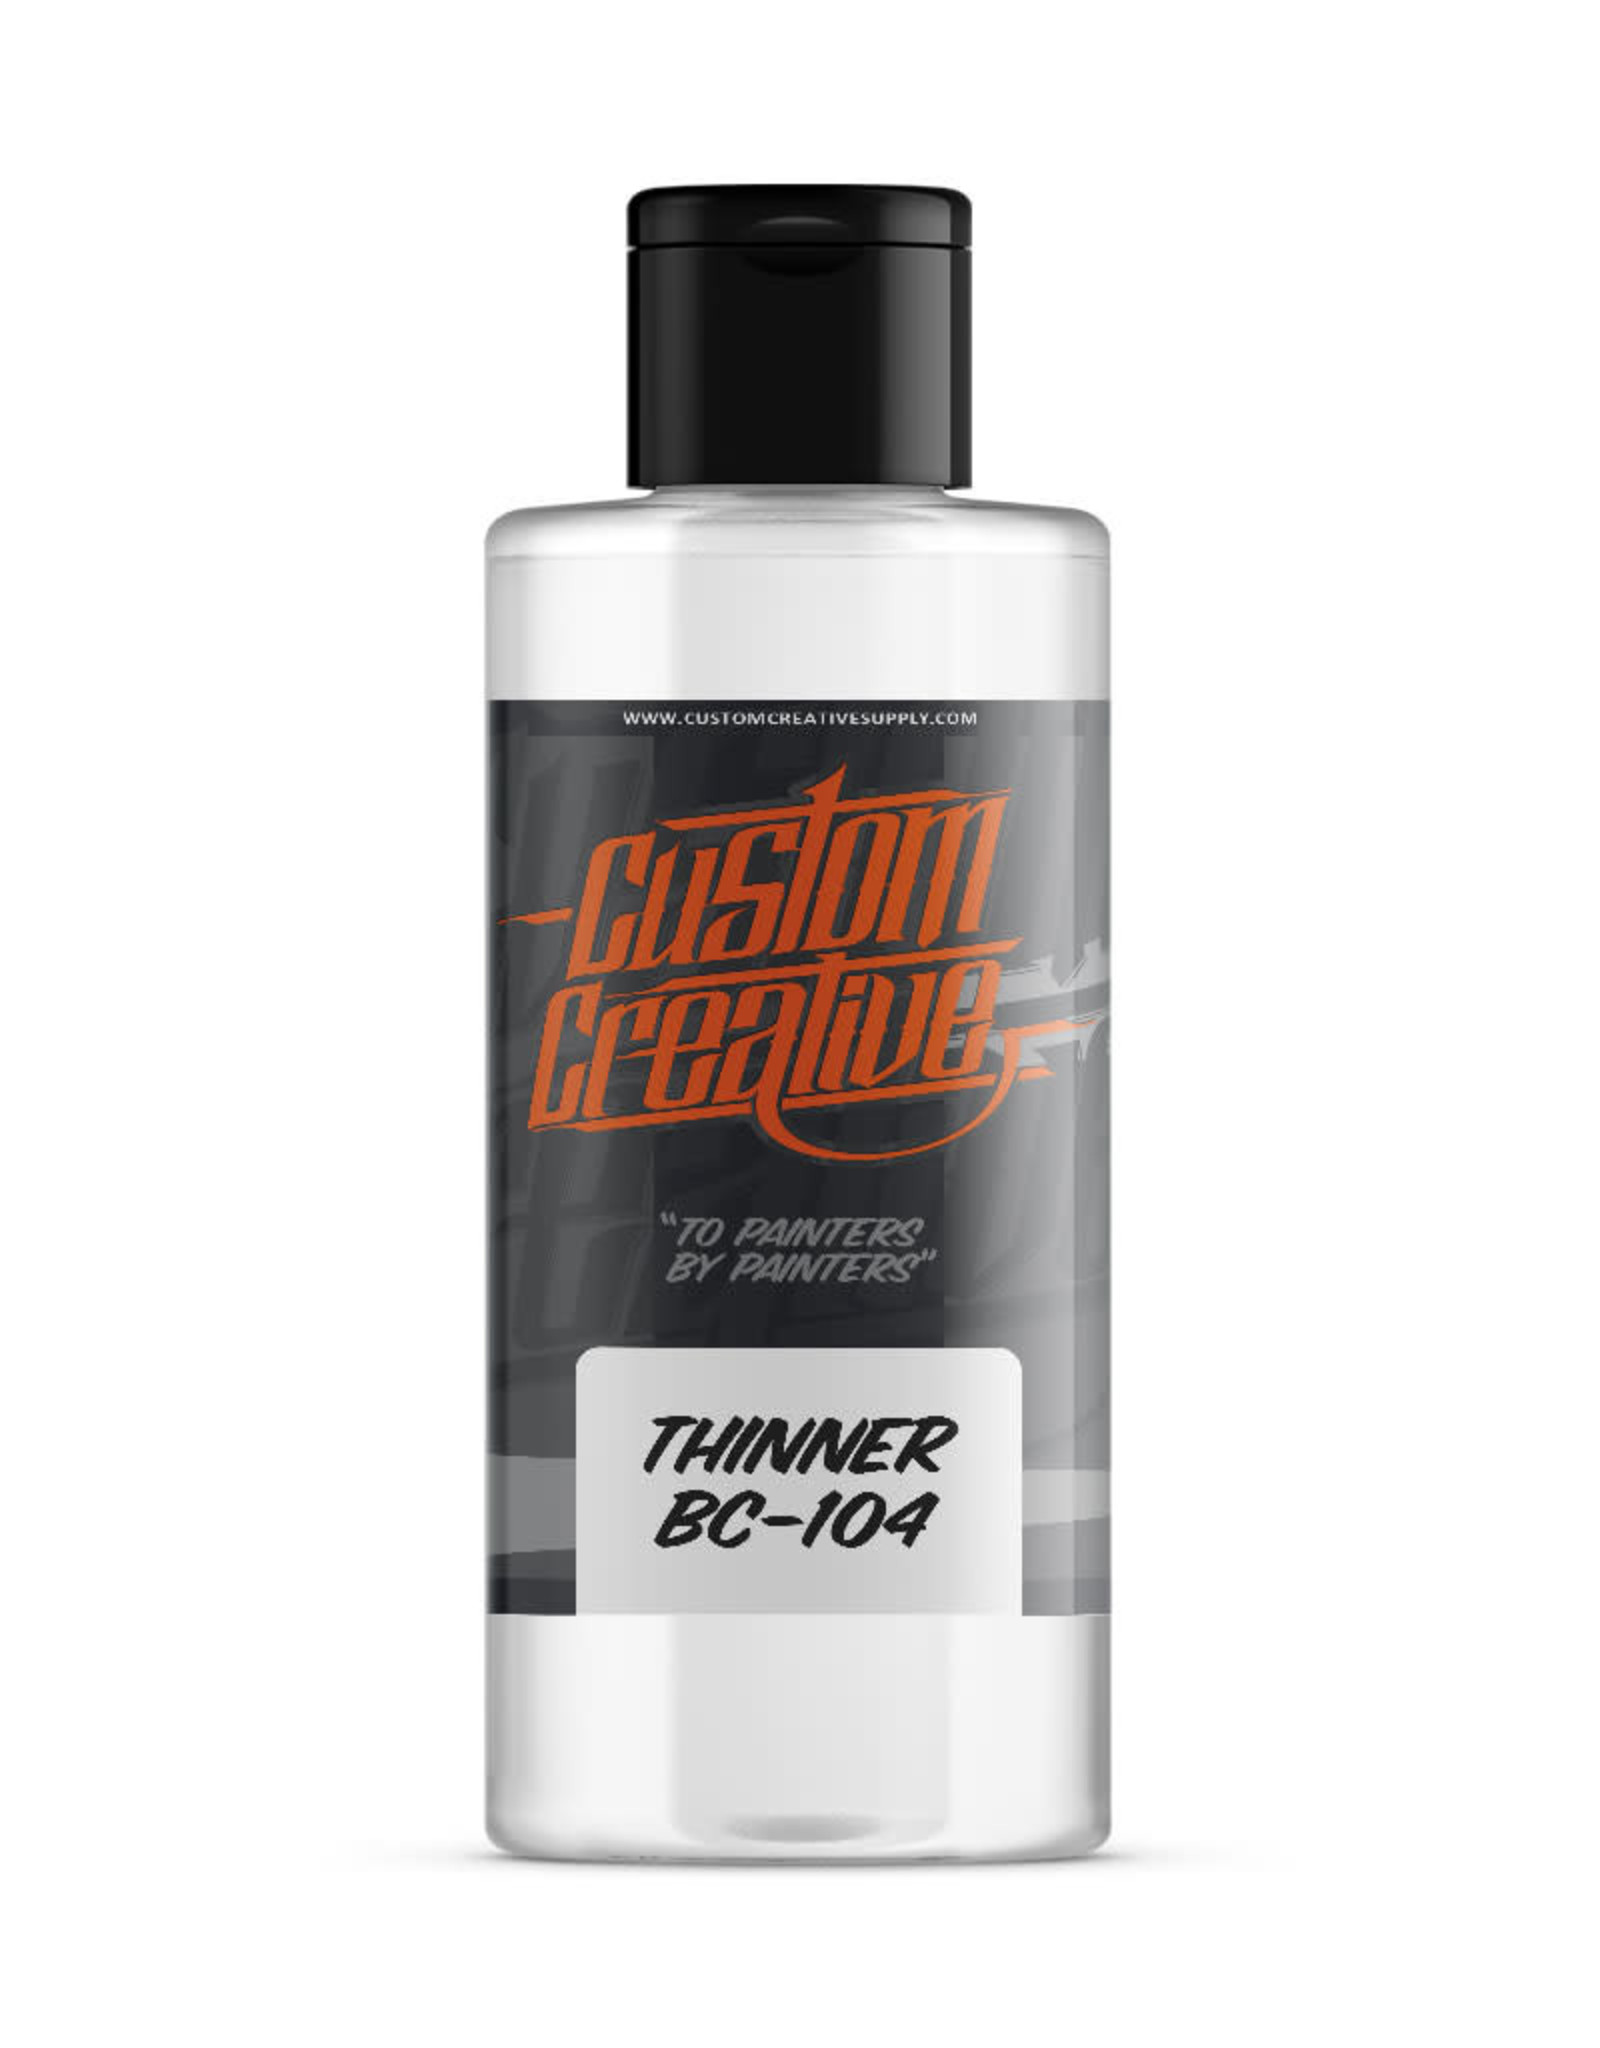 Custom Creative Custom Creative BC-104 (Standard) Acrylic Thinner